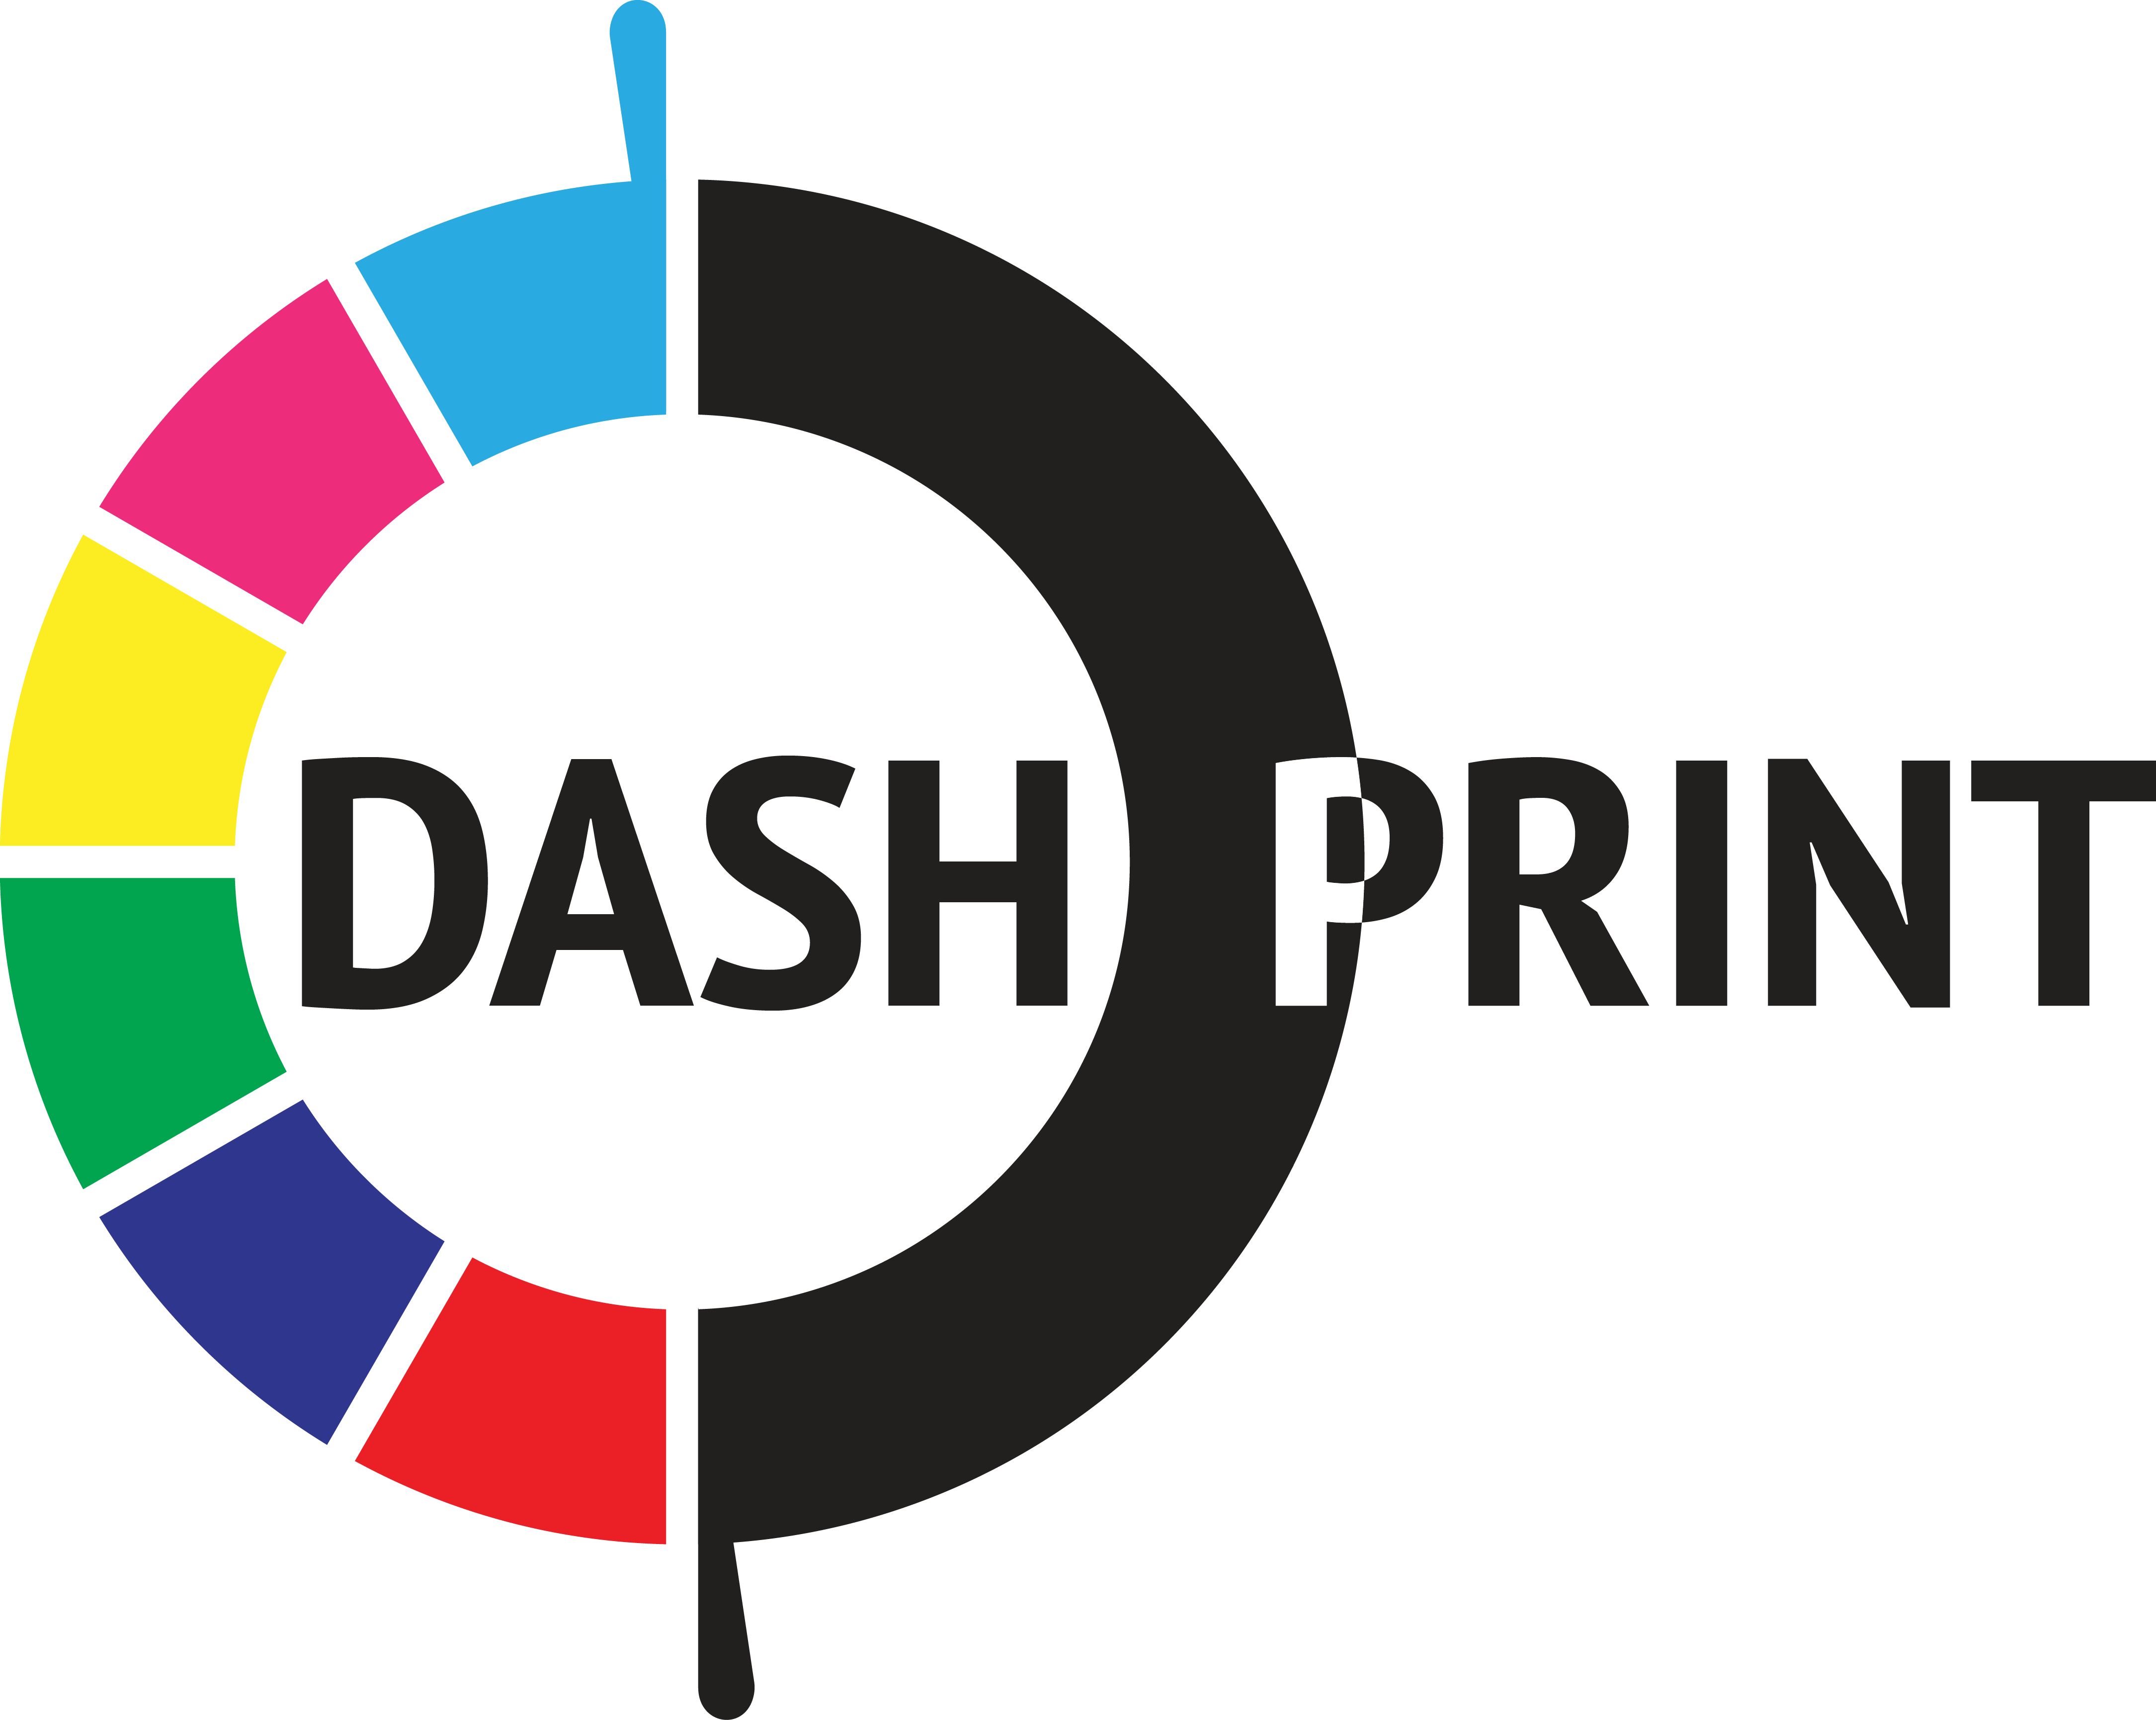 Dash Print Ltd